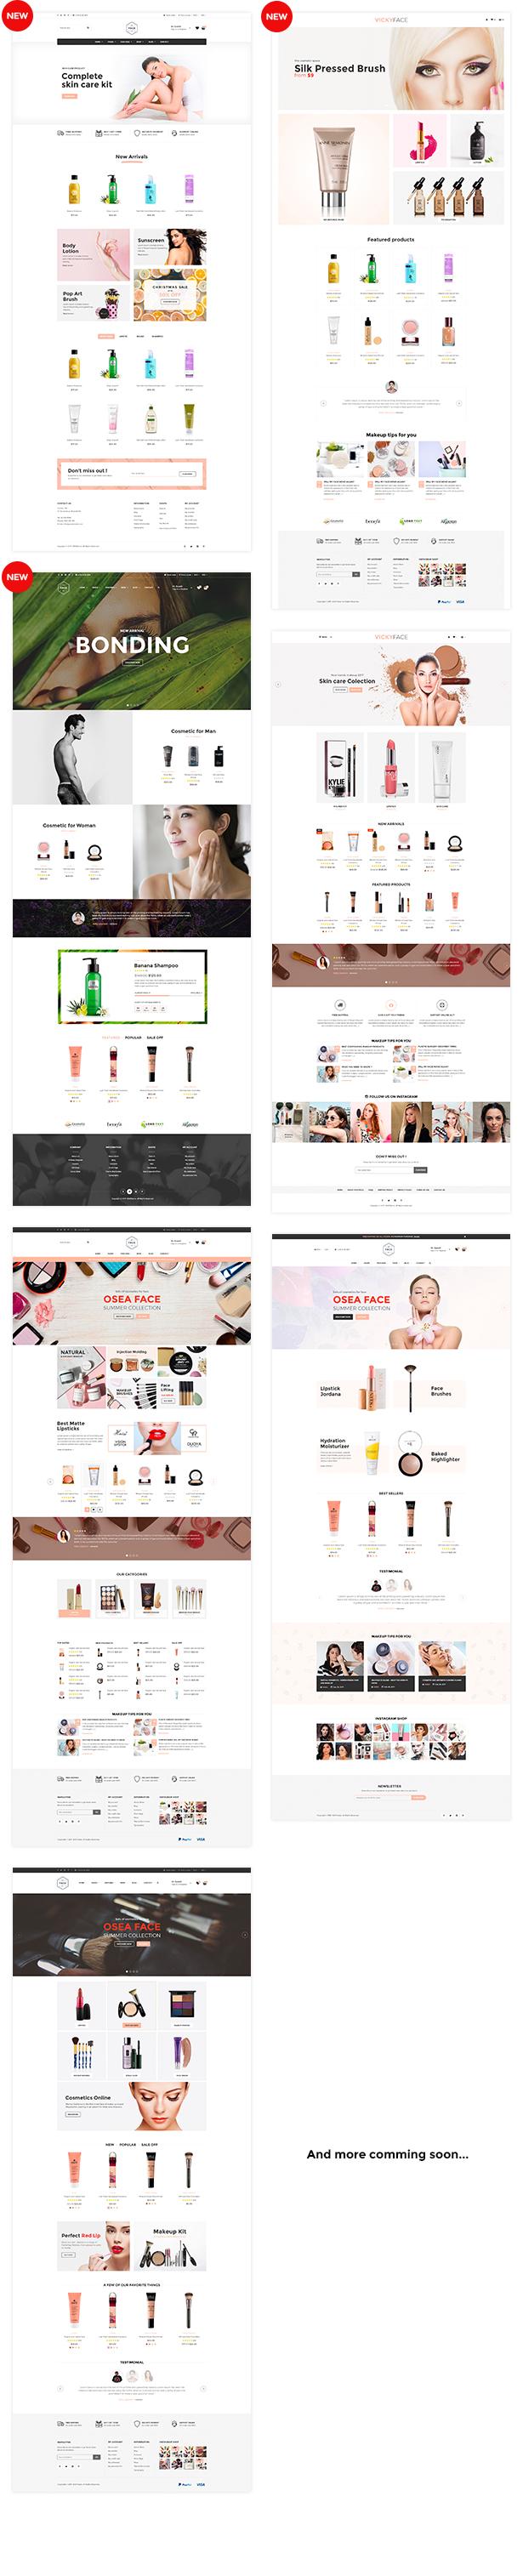 SNS Vicky - Cosmetic WooCommerce WordPress Theme - 4